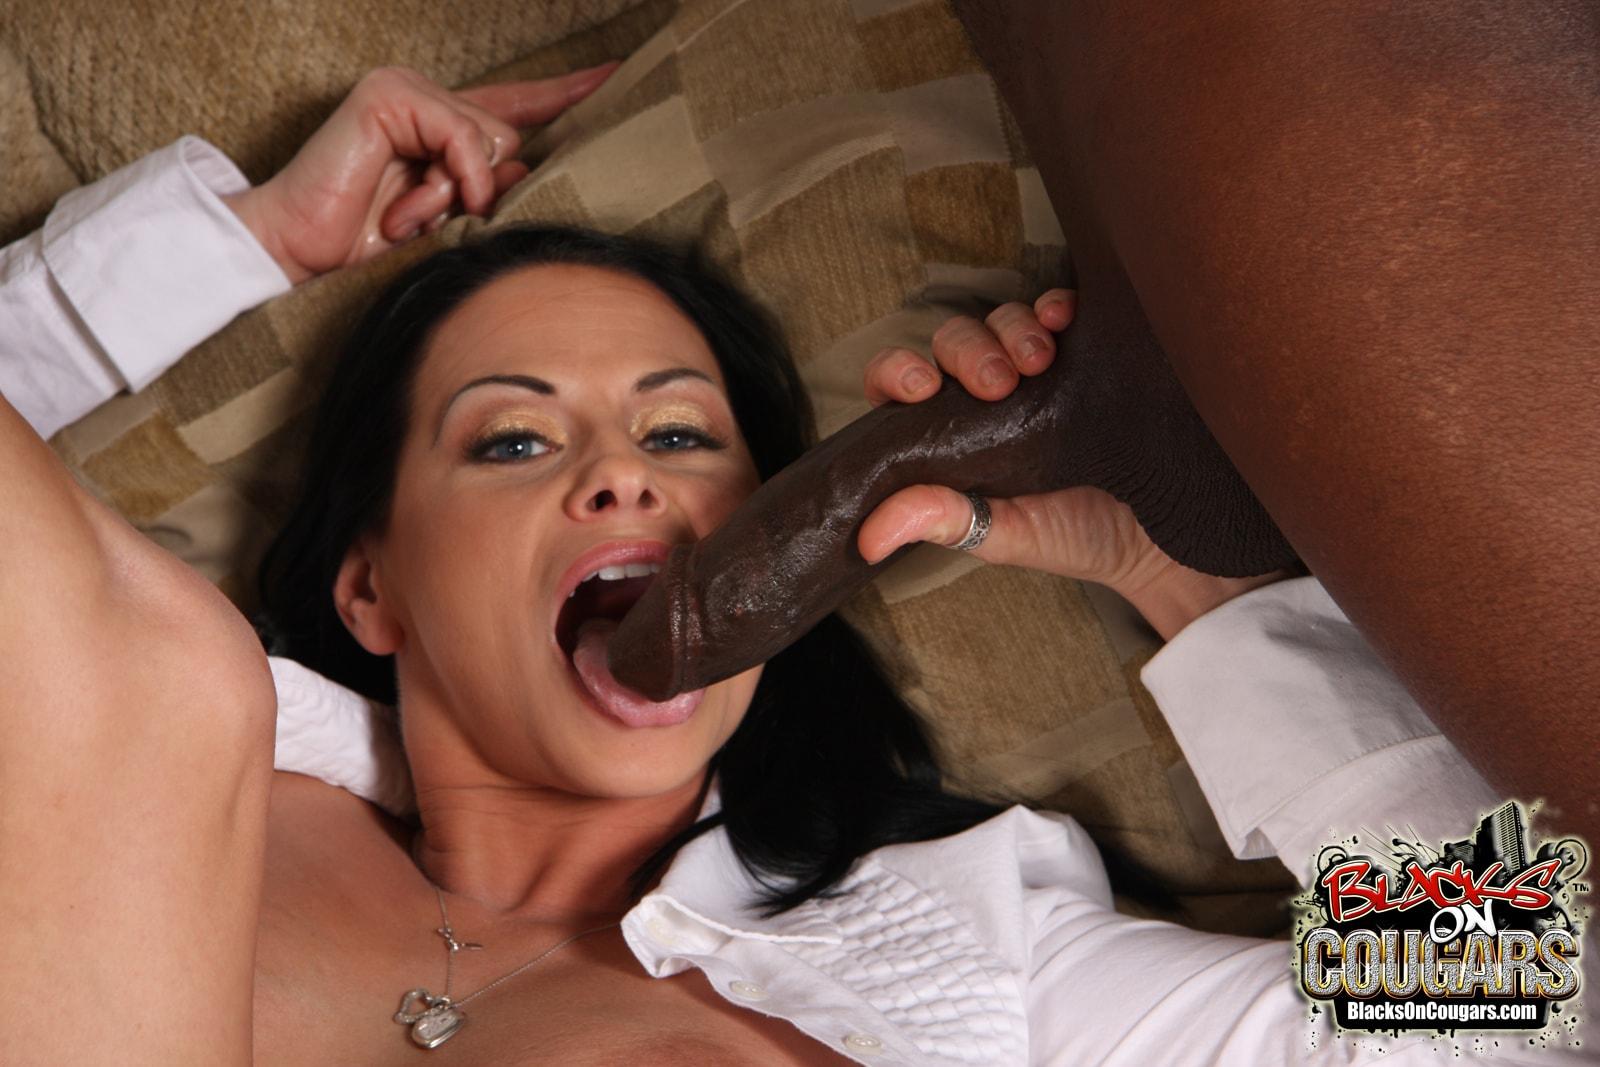 Dogfart '- Blacks On Cougars' starring Harley Raines (Photo 22)